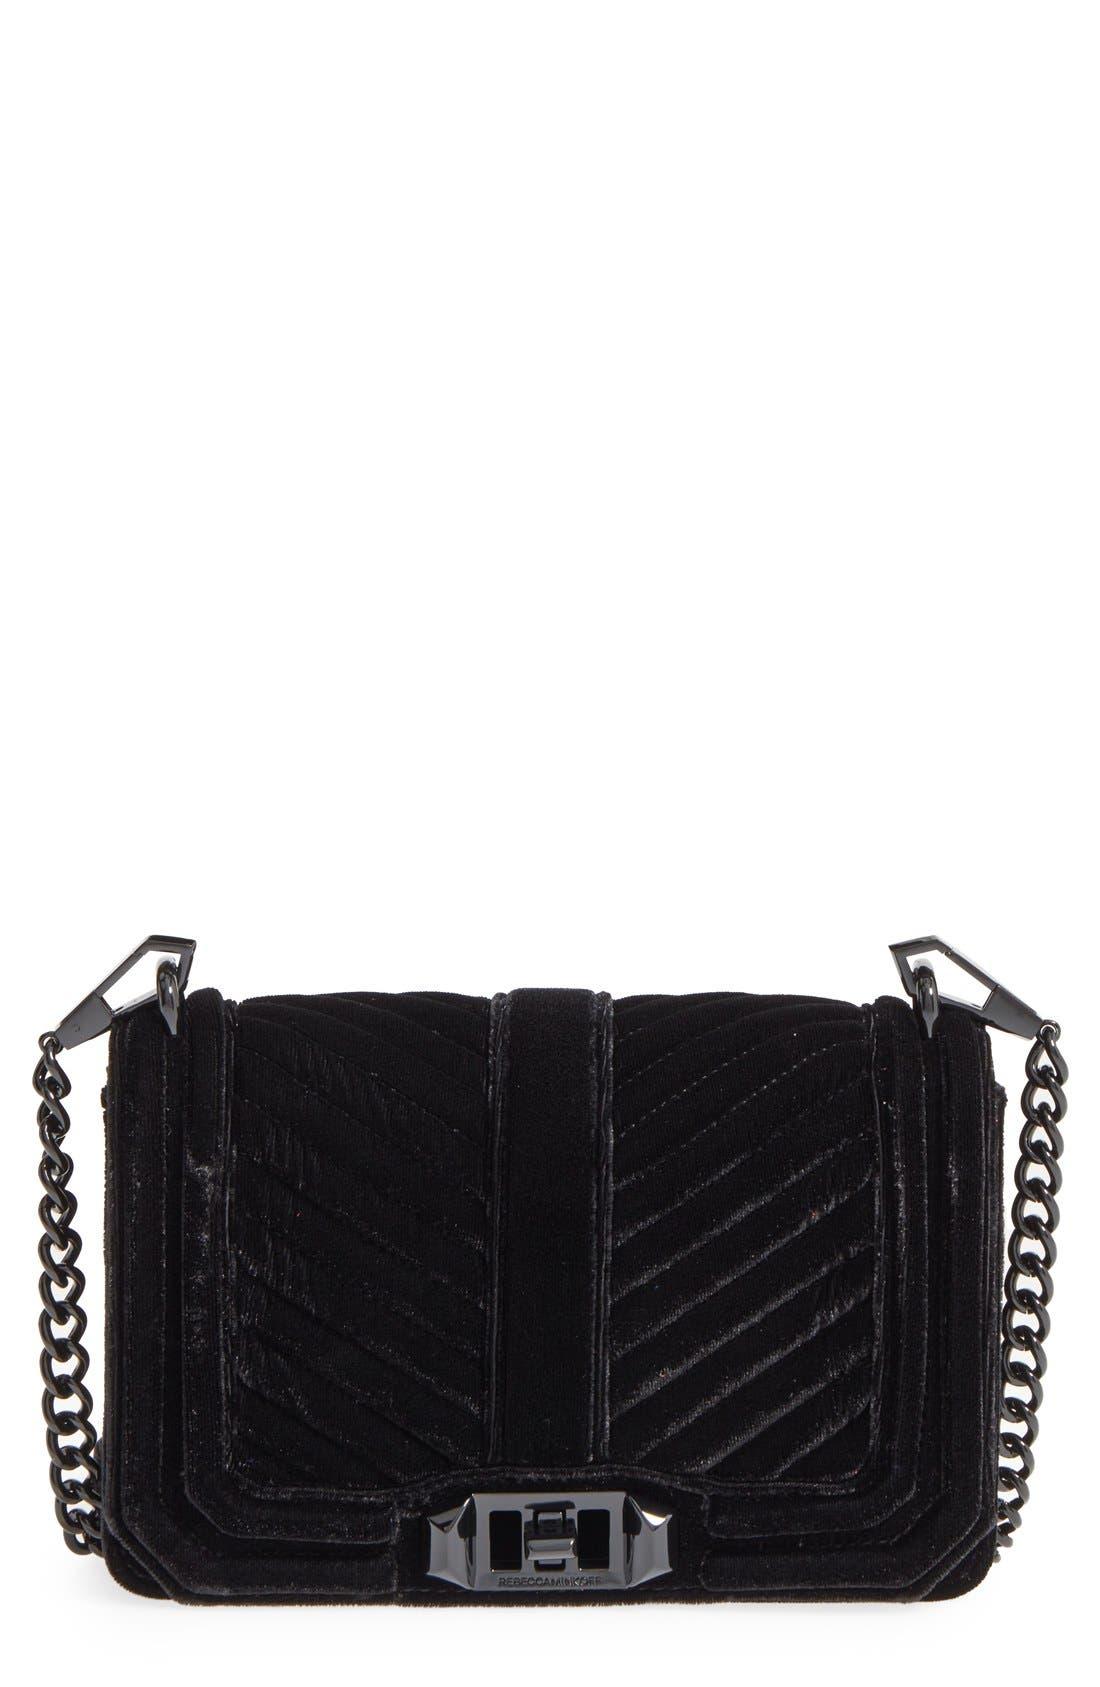 Alternate Image 1 Selected - Rebecca Minkoff Small Love Quilted Velvet Crossbody Bag